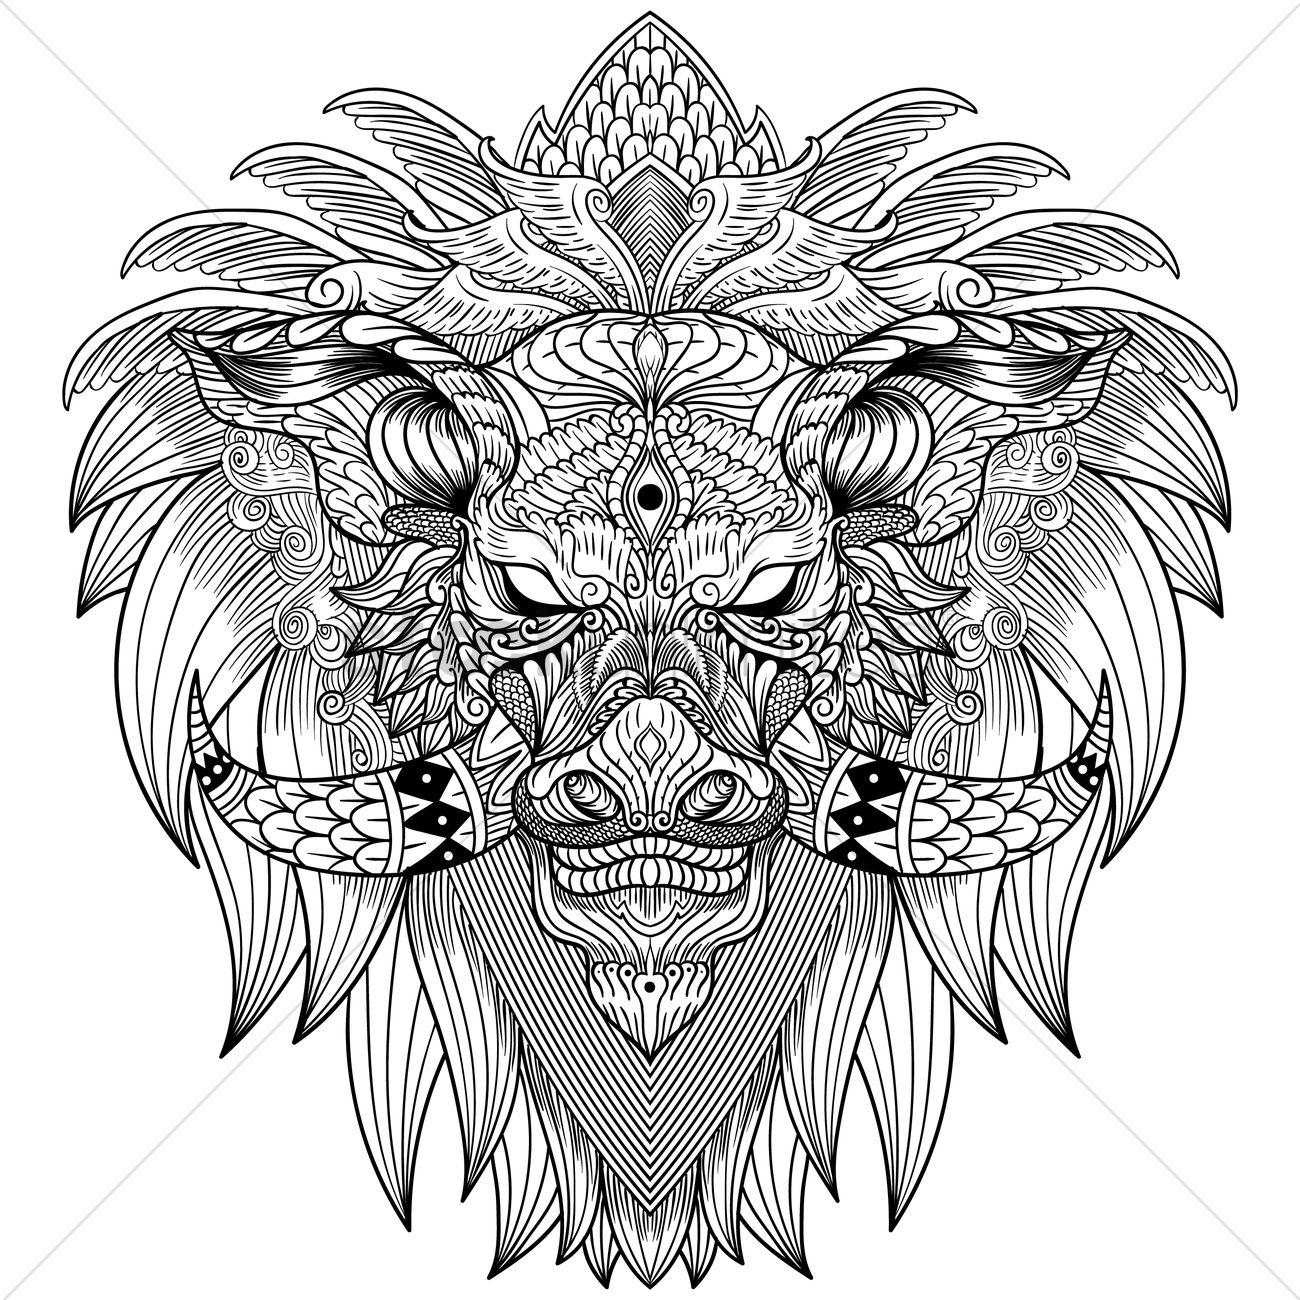 1300x1300 Free Intricate Boar Design Vector Image